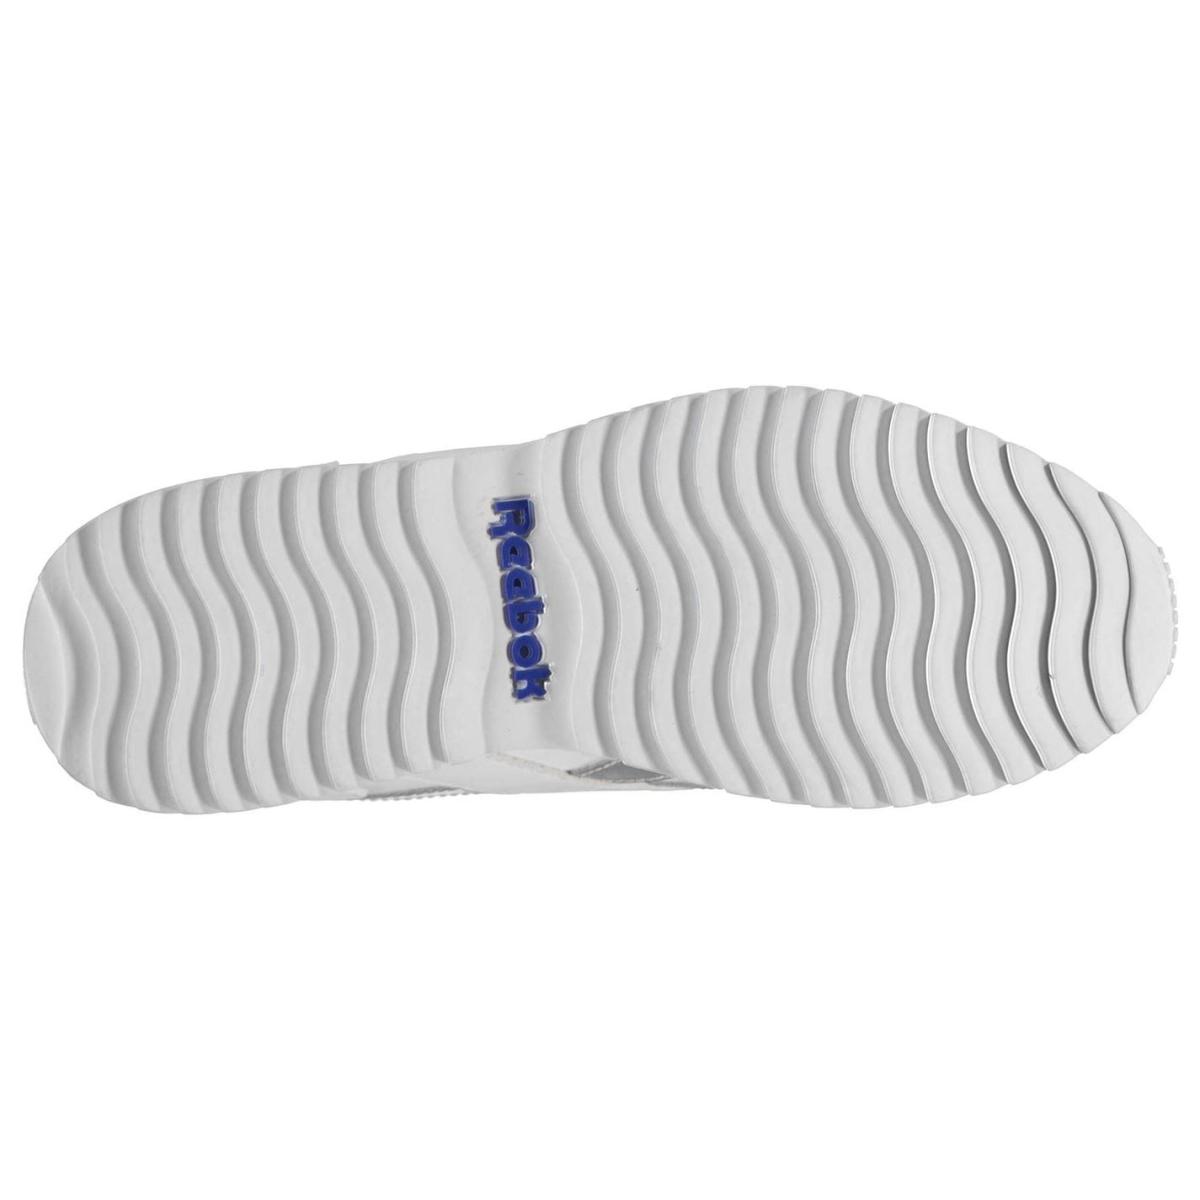 Reebok-Royal-Glide-Turnschuhe-Laufschuhe-Damen-Sneaker-Trainers-Sportschuhe-8001 Indexbild 9